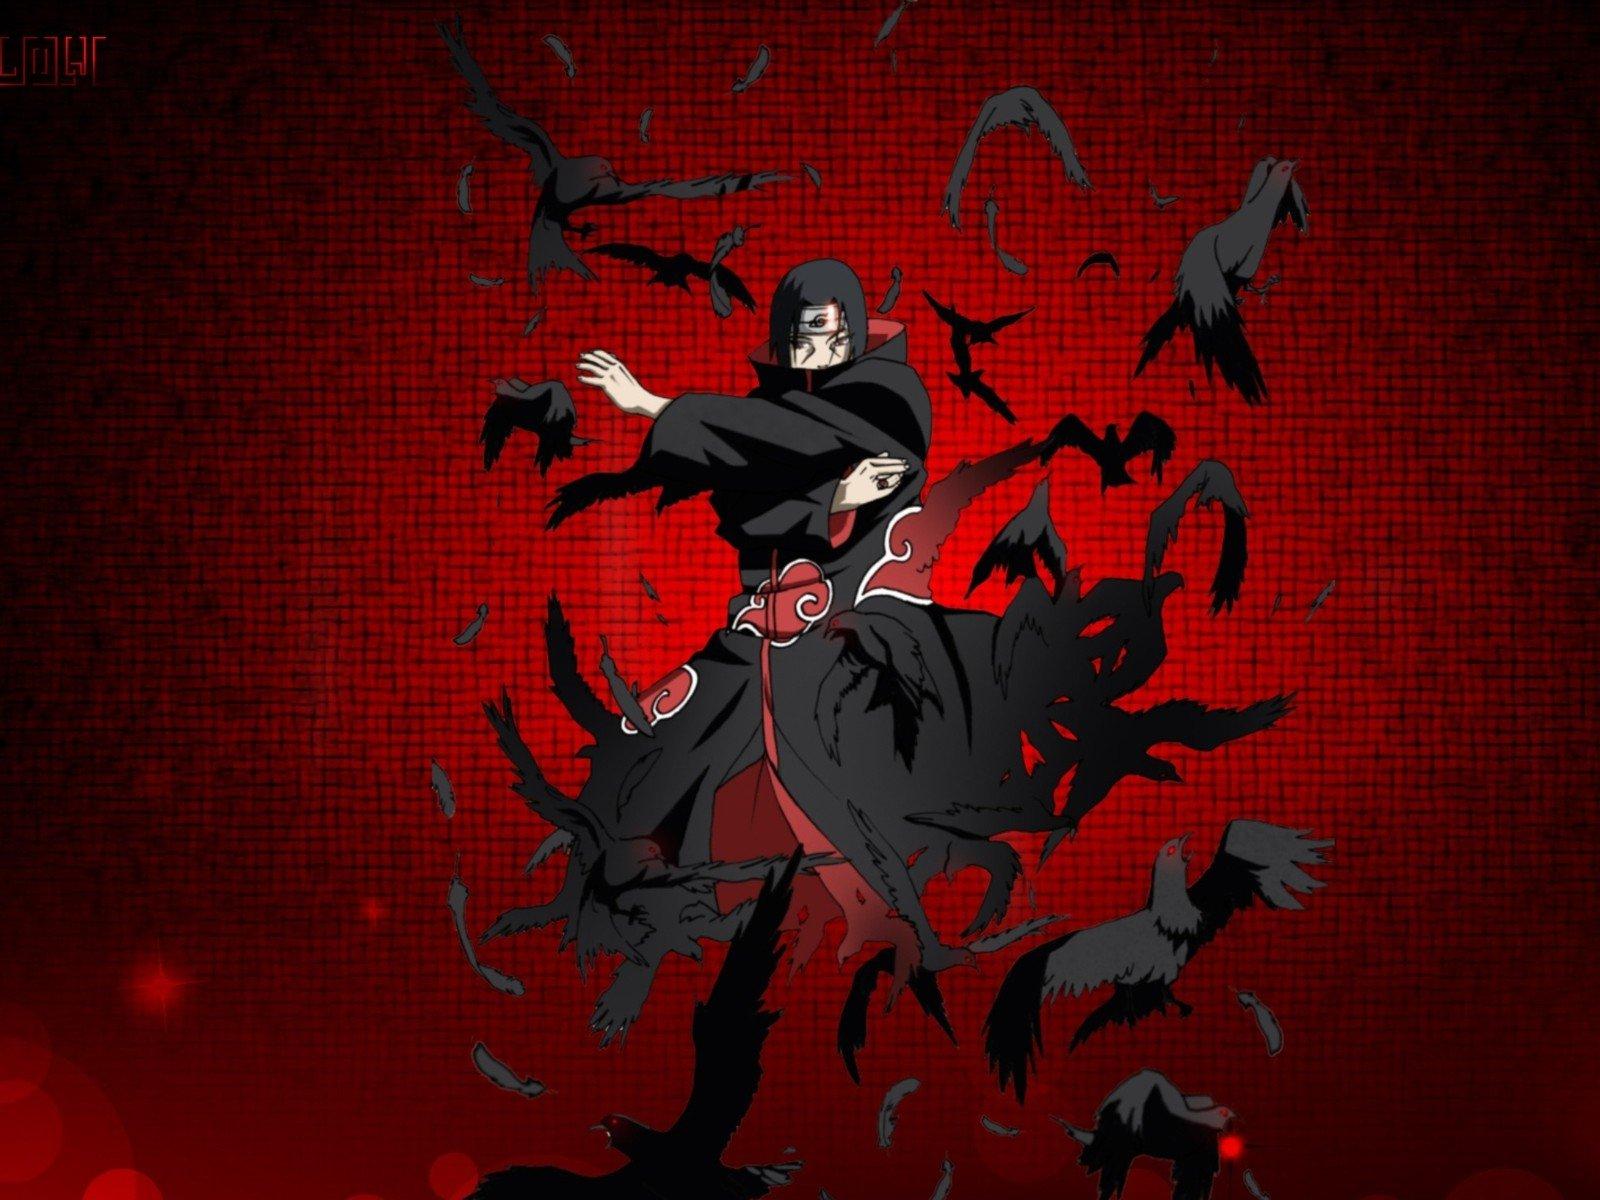 Uchiha Itachi Raven Red Background Akatsuki Anime Boys Hd Wallpapers Desktop And Mobile Images Photos